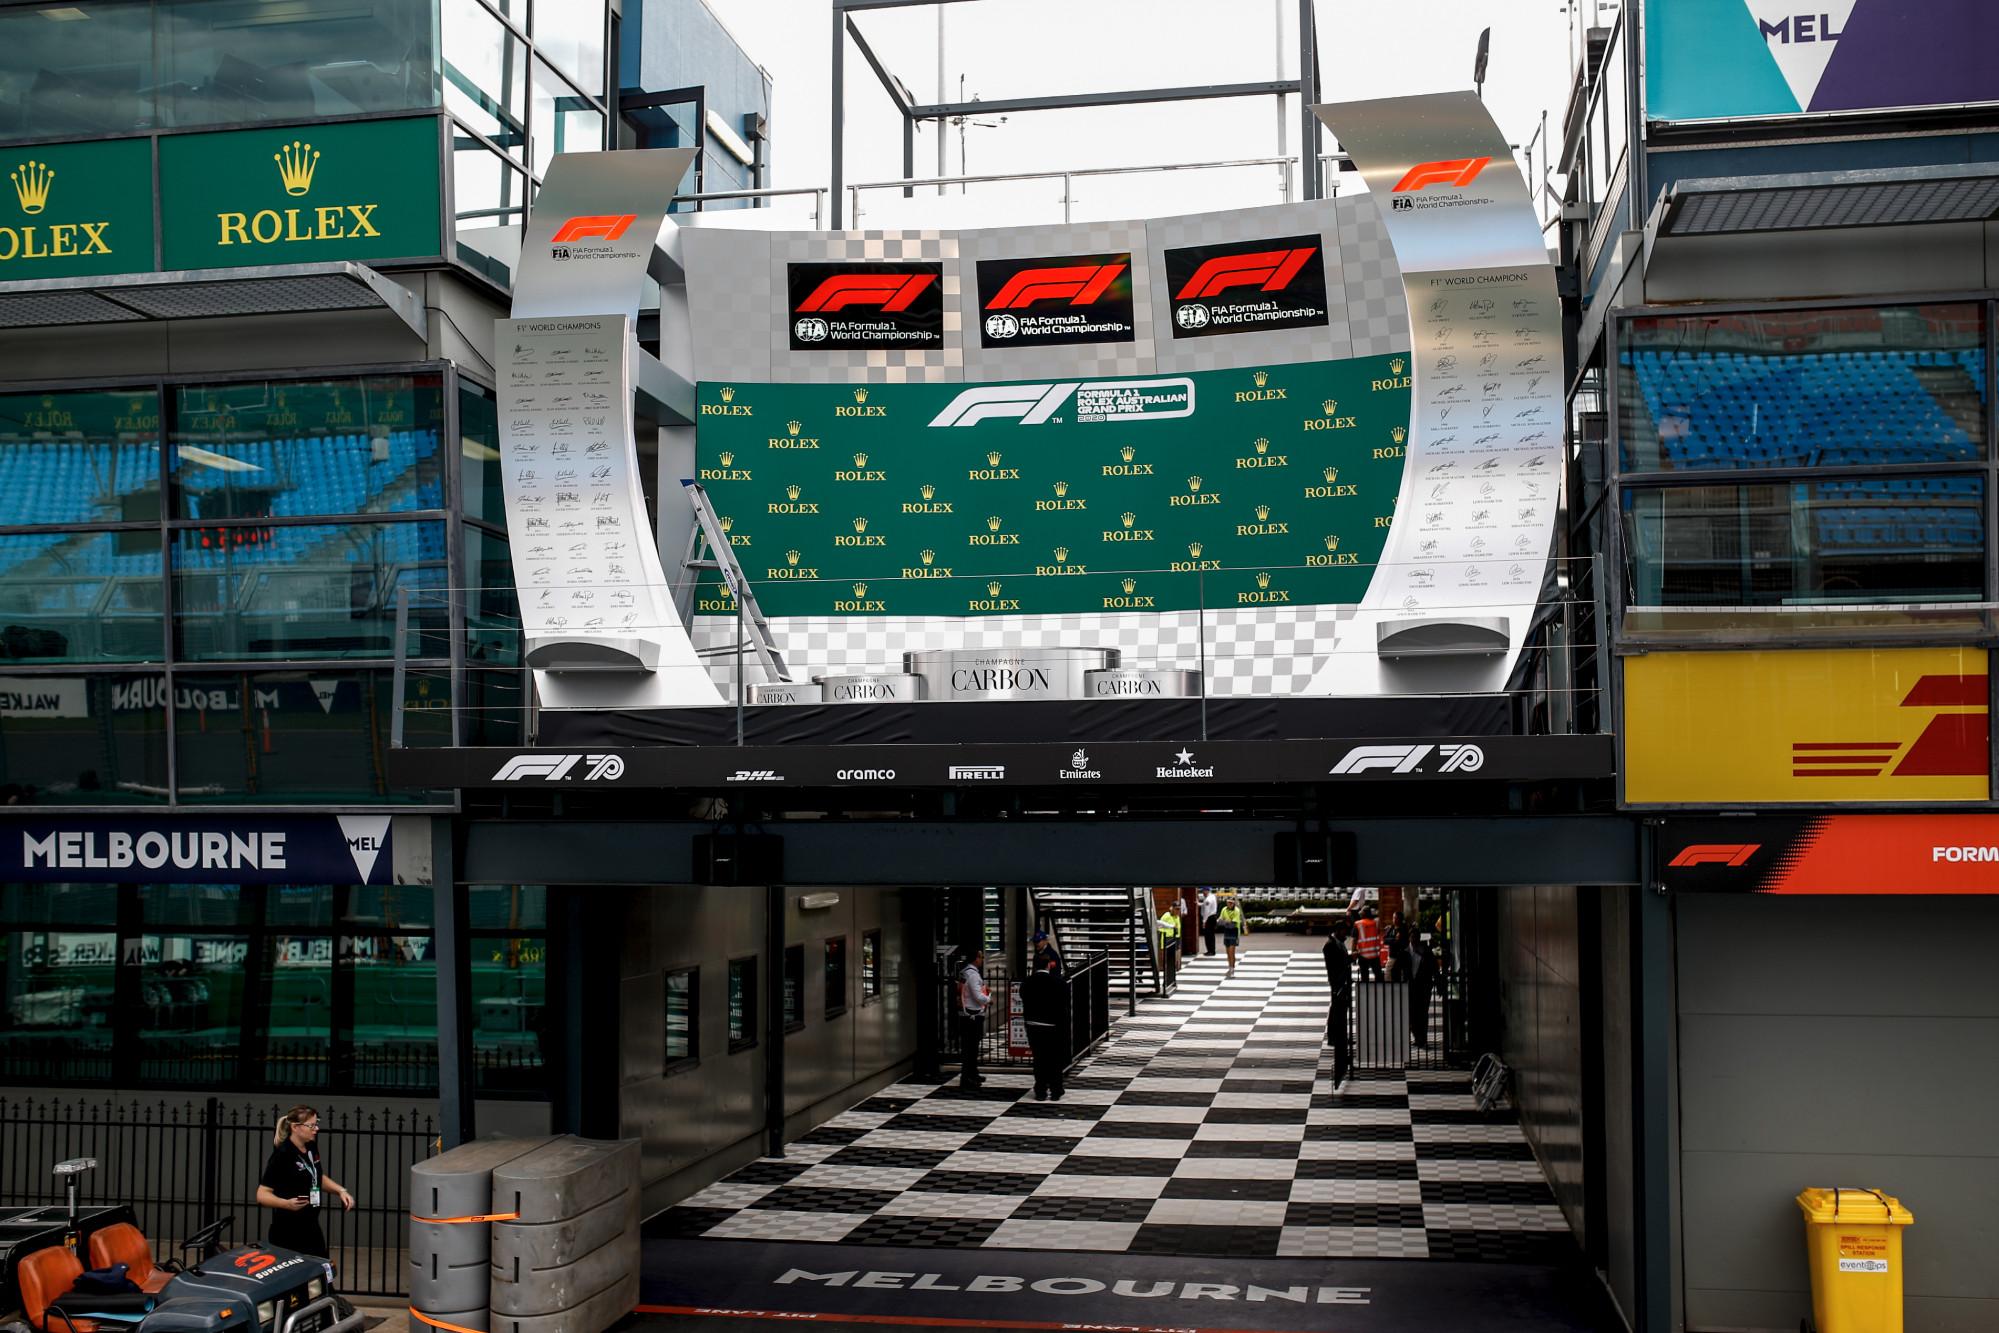 An empty podium at the 2020 Australian Grand Prix